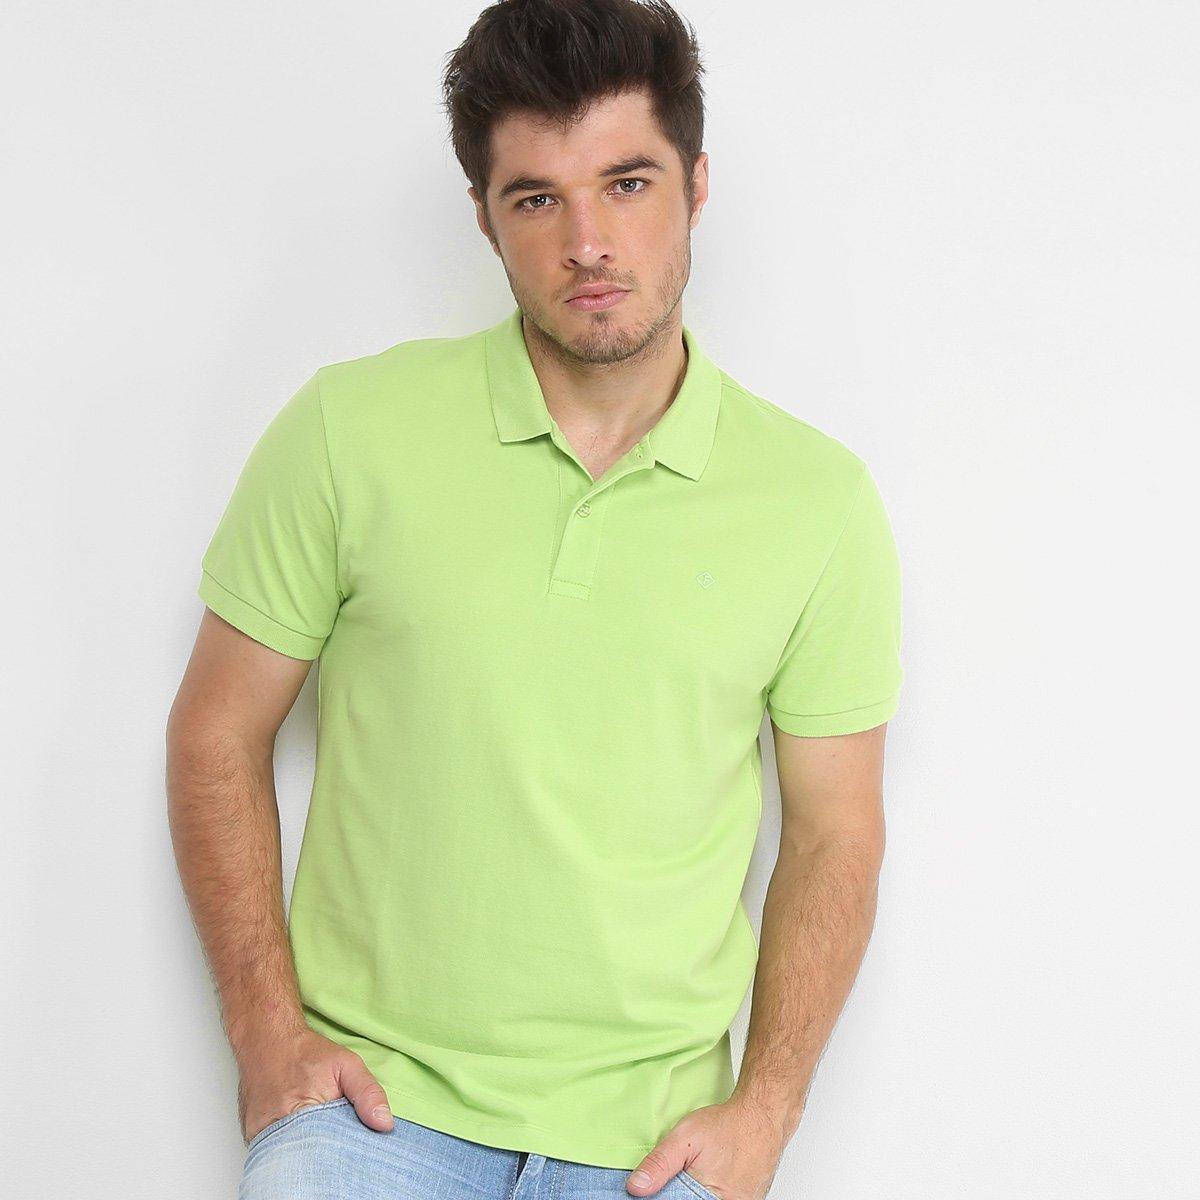 a7a5c6f0f0 Camisa Polo Forum Piquet Masculina - Verde - Compre Agora